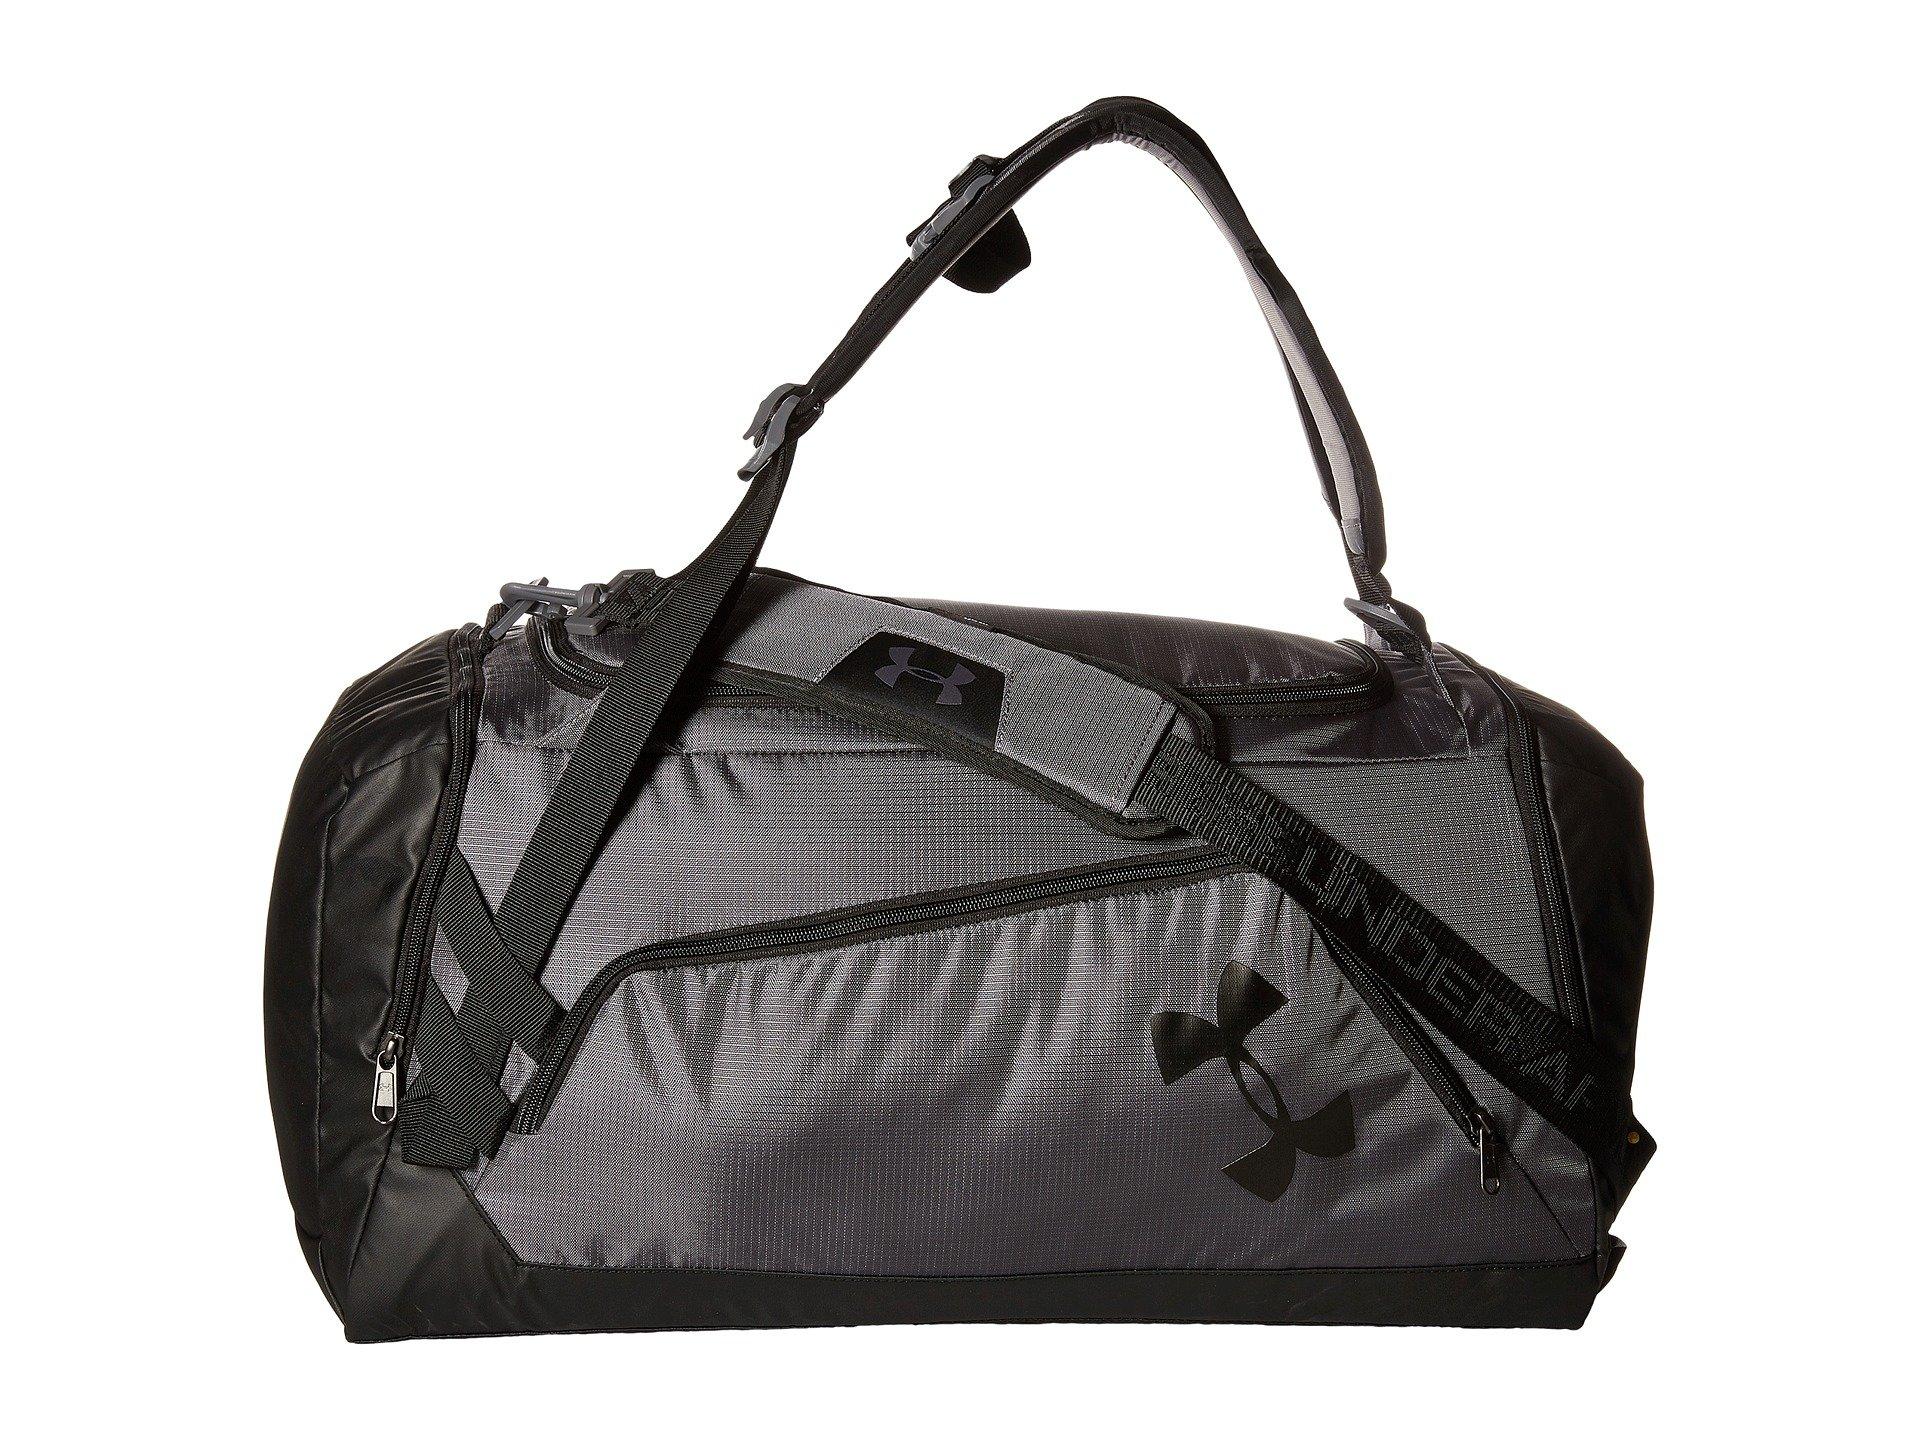 Bolso de Lona para Hombre Under Armour UA Contain Duo+ Backpack/Duffel  + Under Armour en VeoyCompro.net